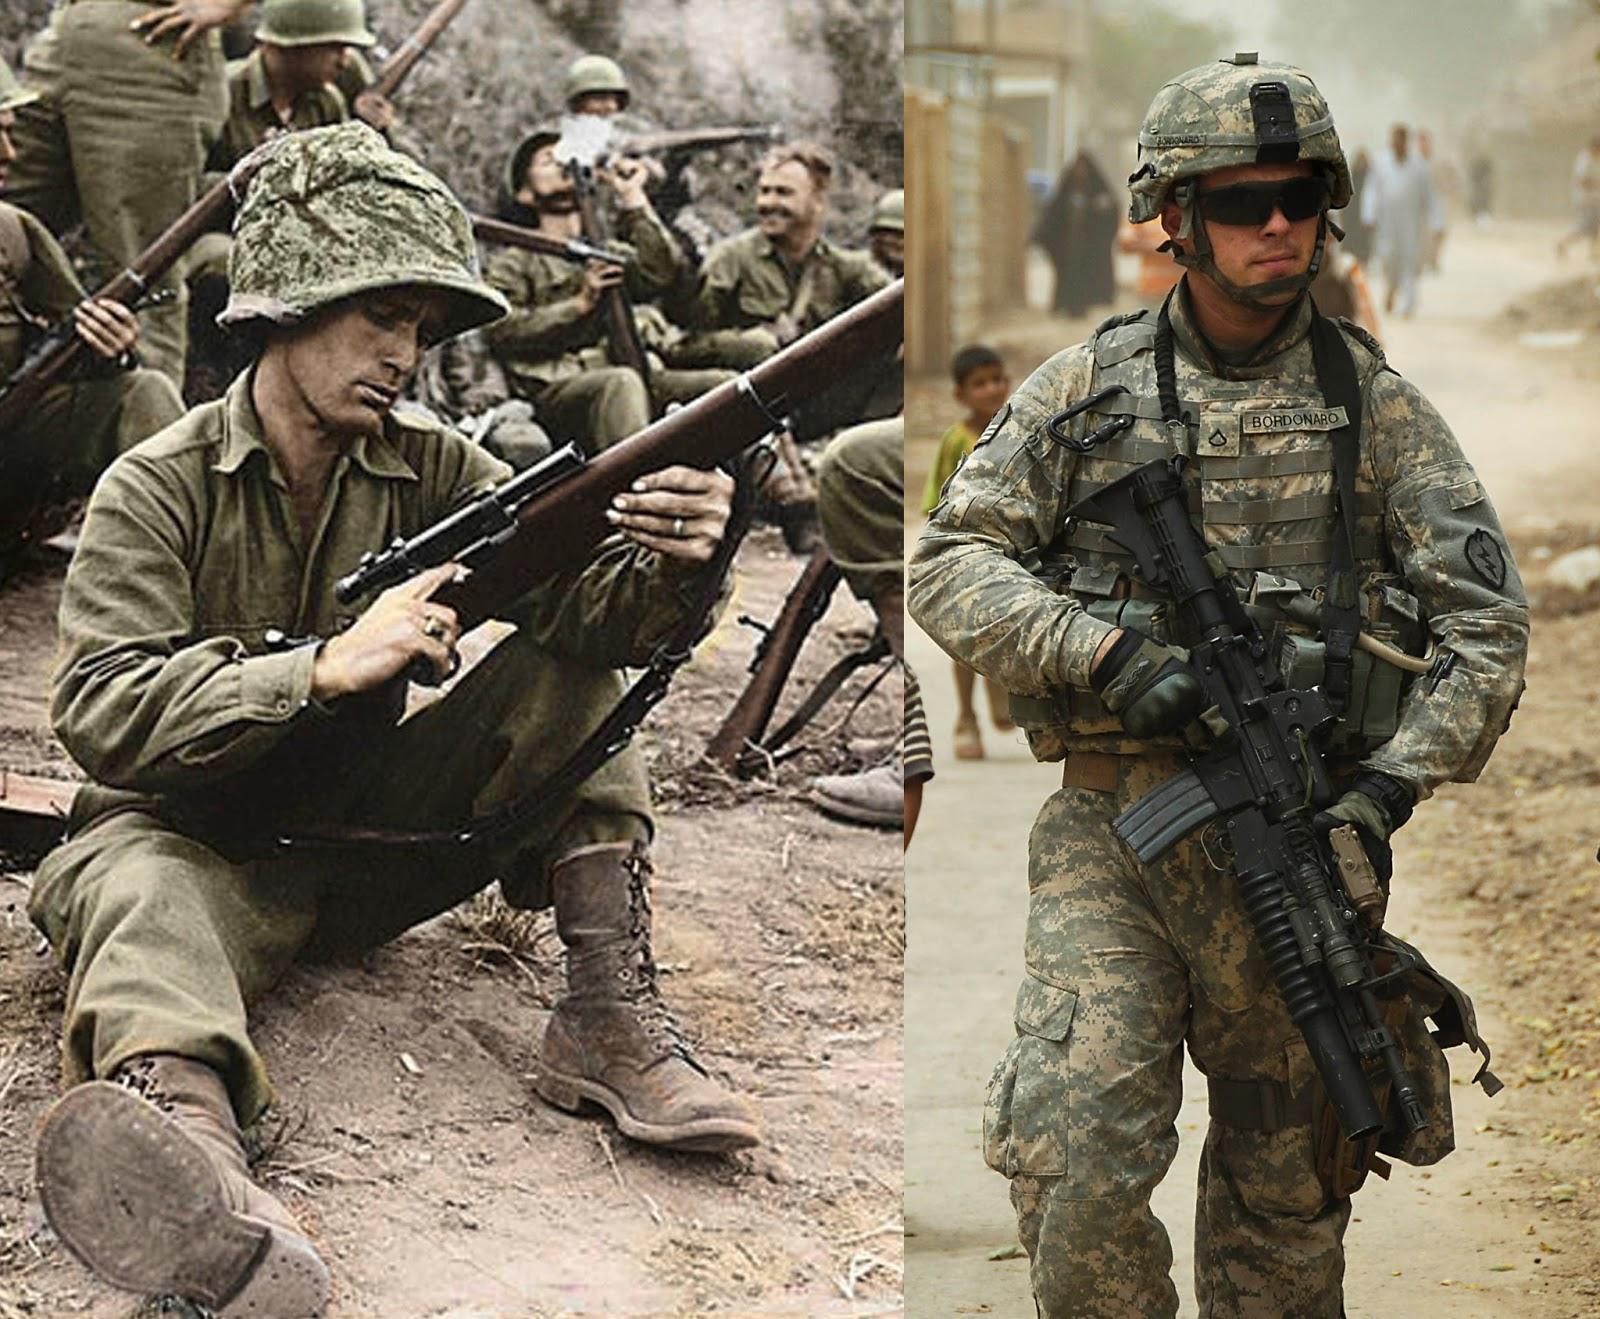 Iraq Wars 10th Anniversary: The Invasion - The Atlantic